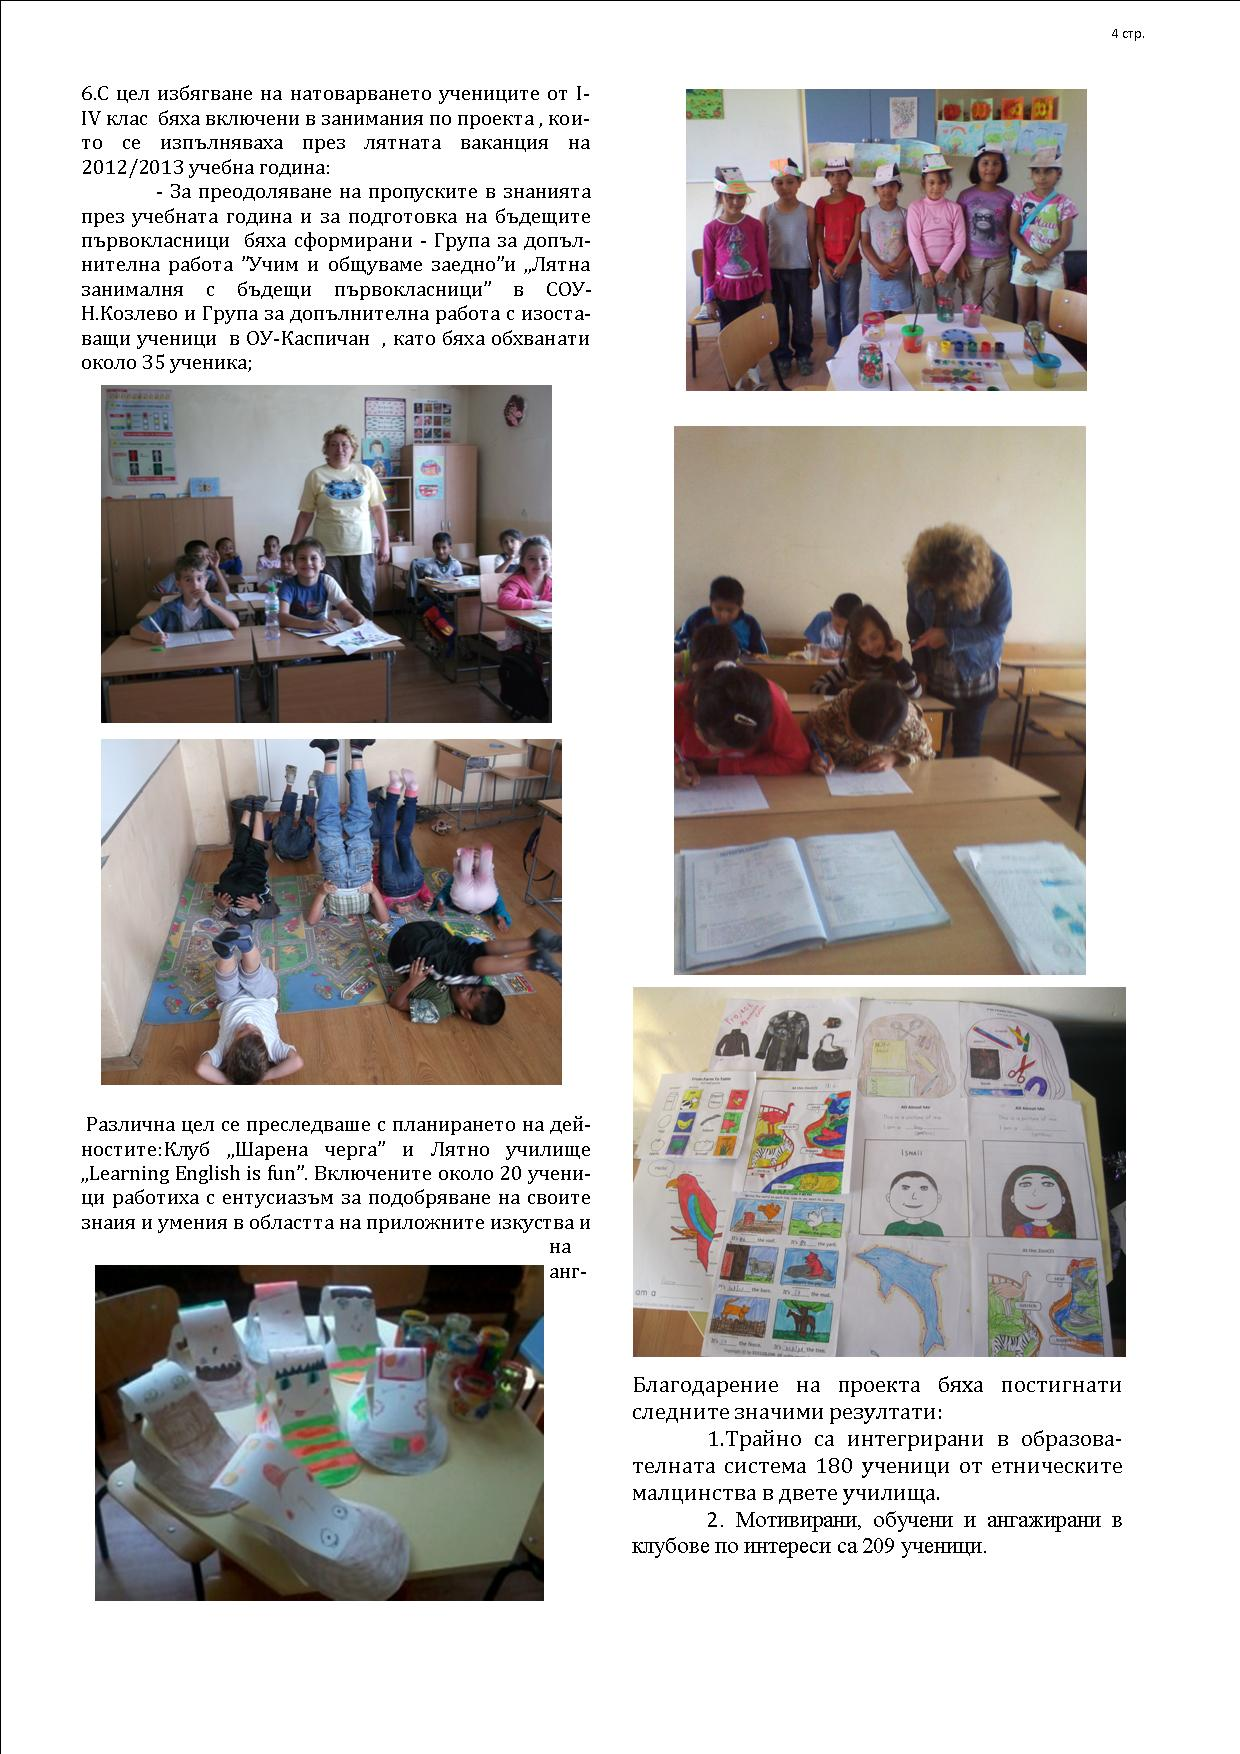 1вестник-10-ти бр-октомври-стр 4 за 2013